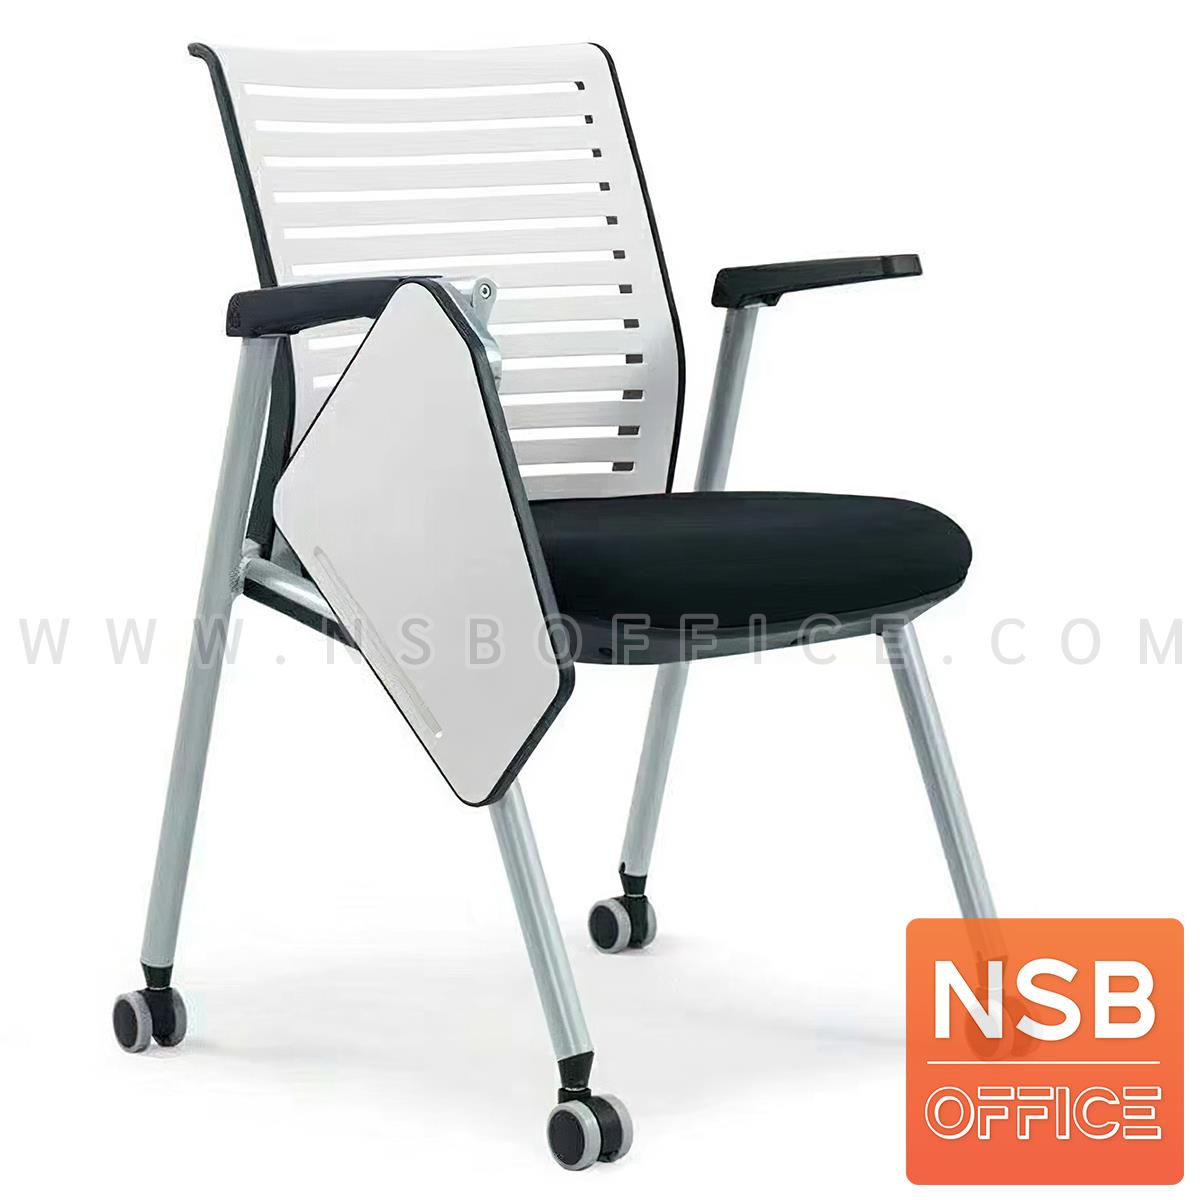 B07A095:เก้าอี้เลคเชอร์ล้อเลื่อน รุ่น JEDI (เจได)  ขาเหล็กพ่นสี